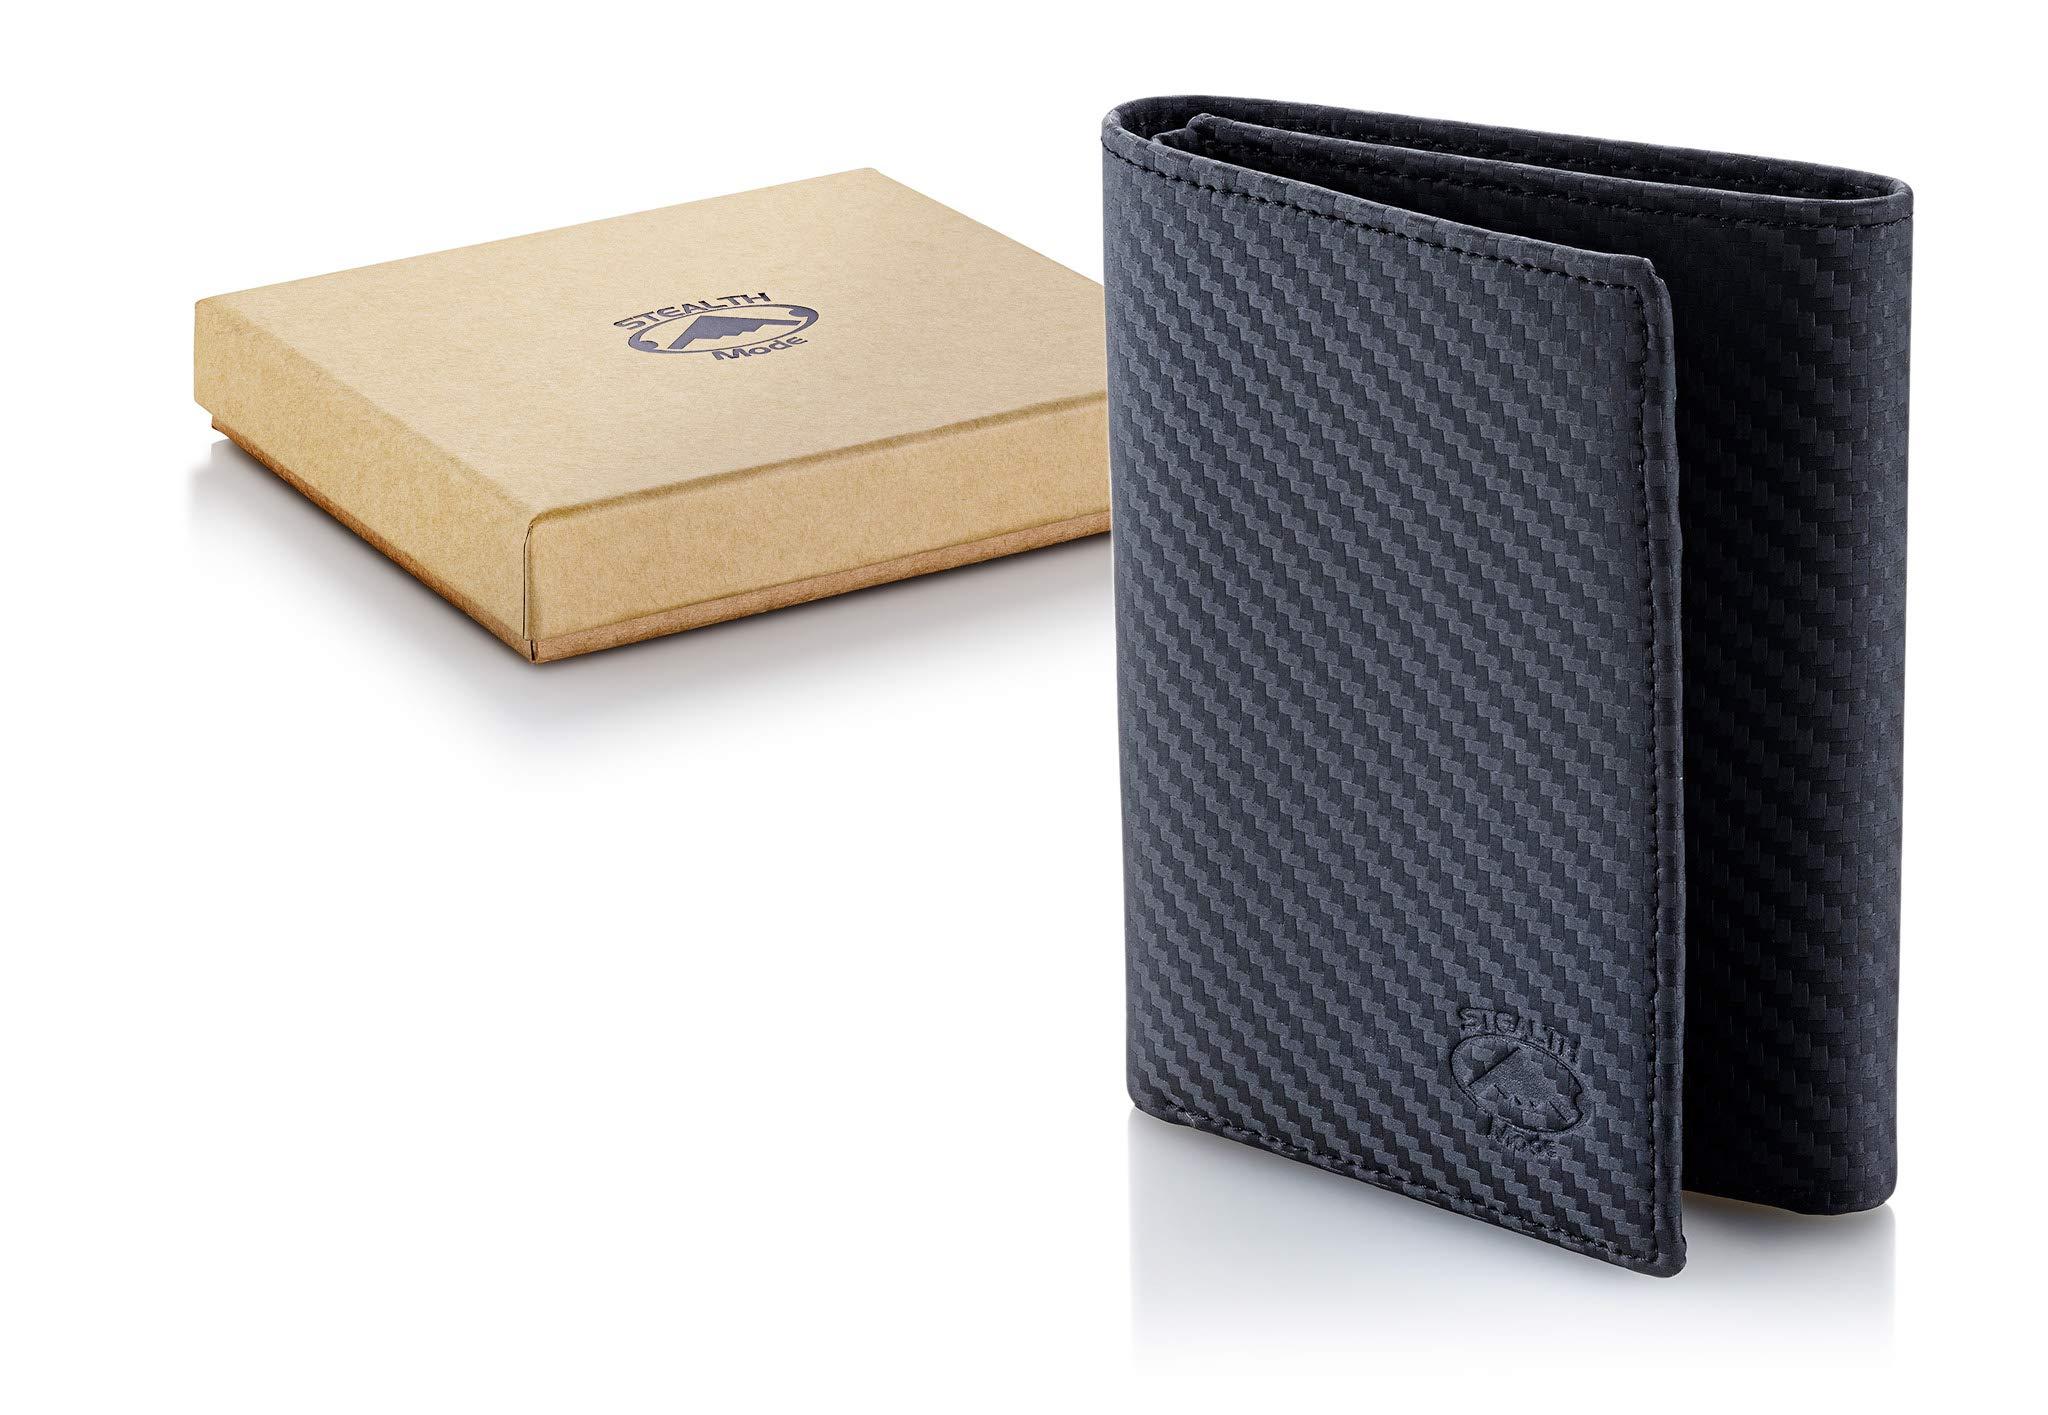 Stealth Mode Trifold RFID Blocking Carbon Fiber Wallet for Men by Stealth Mode (Image #4)